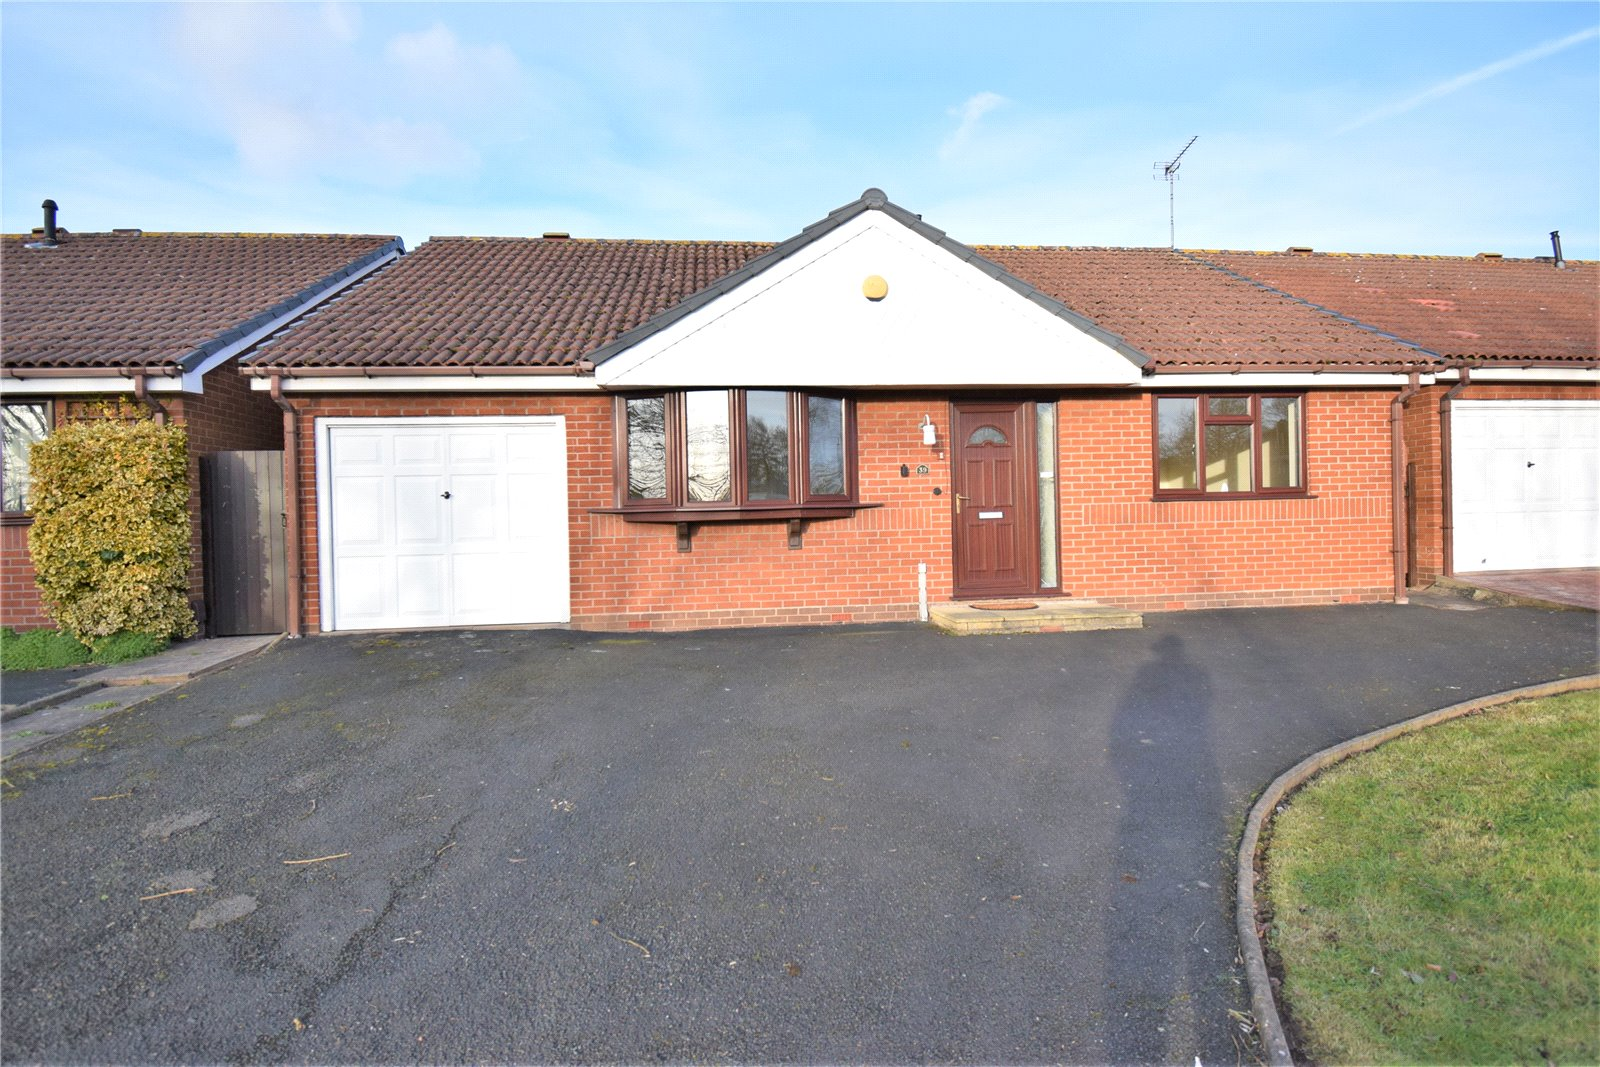 39 Farm Grove, Newport, Shropshire, TF10